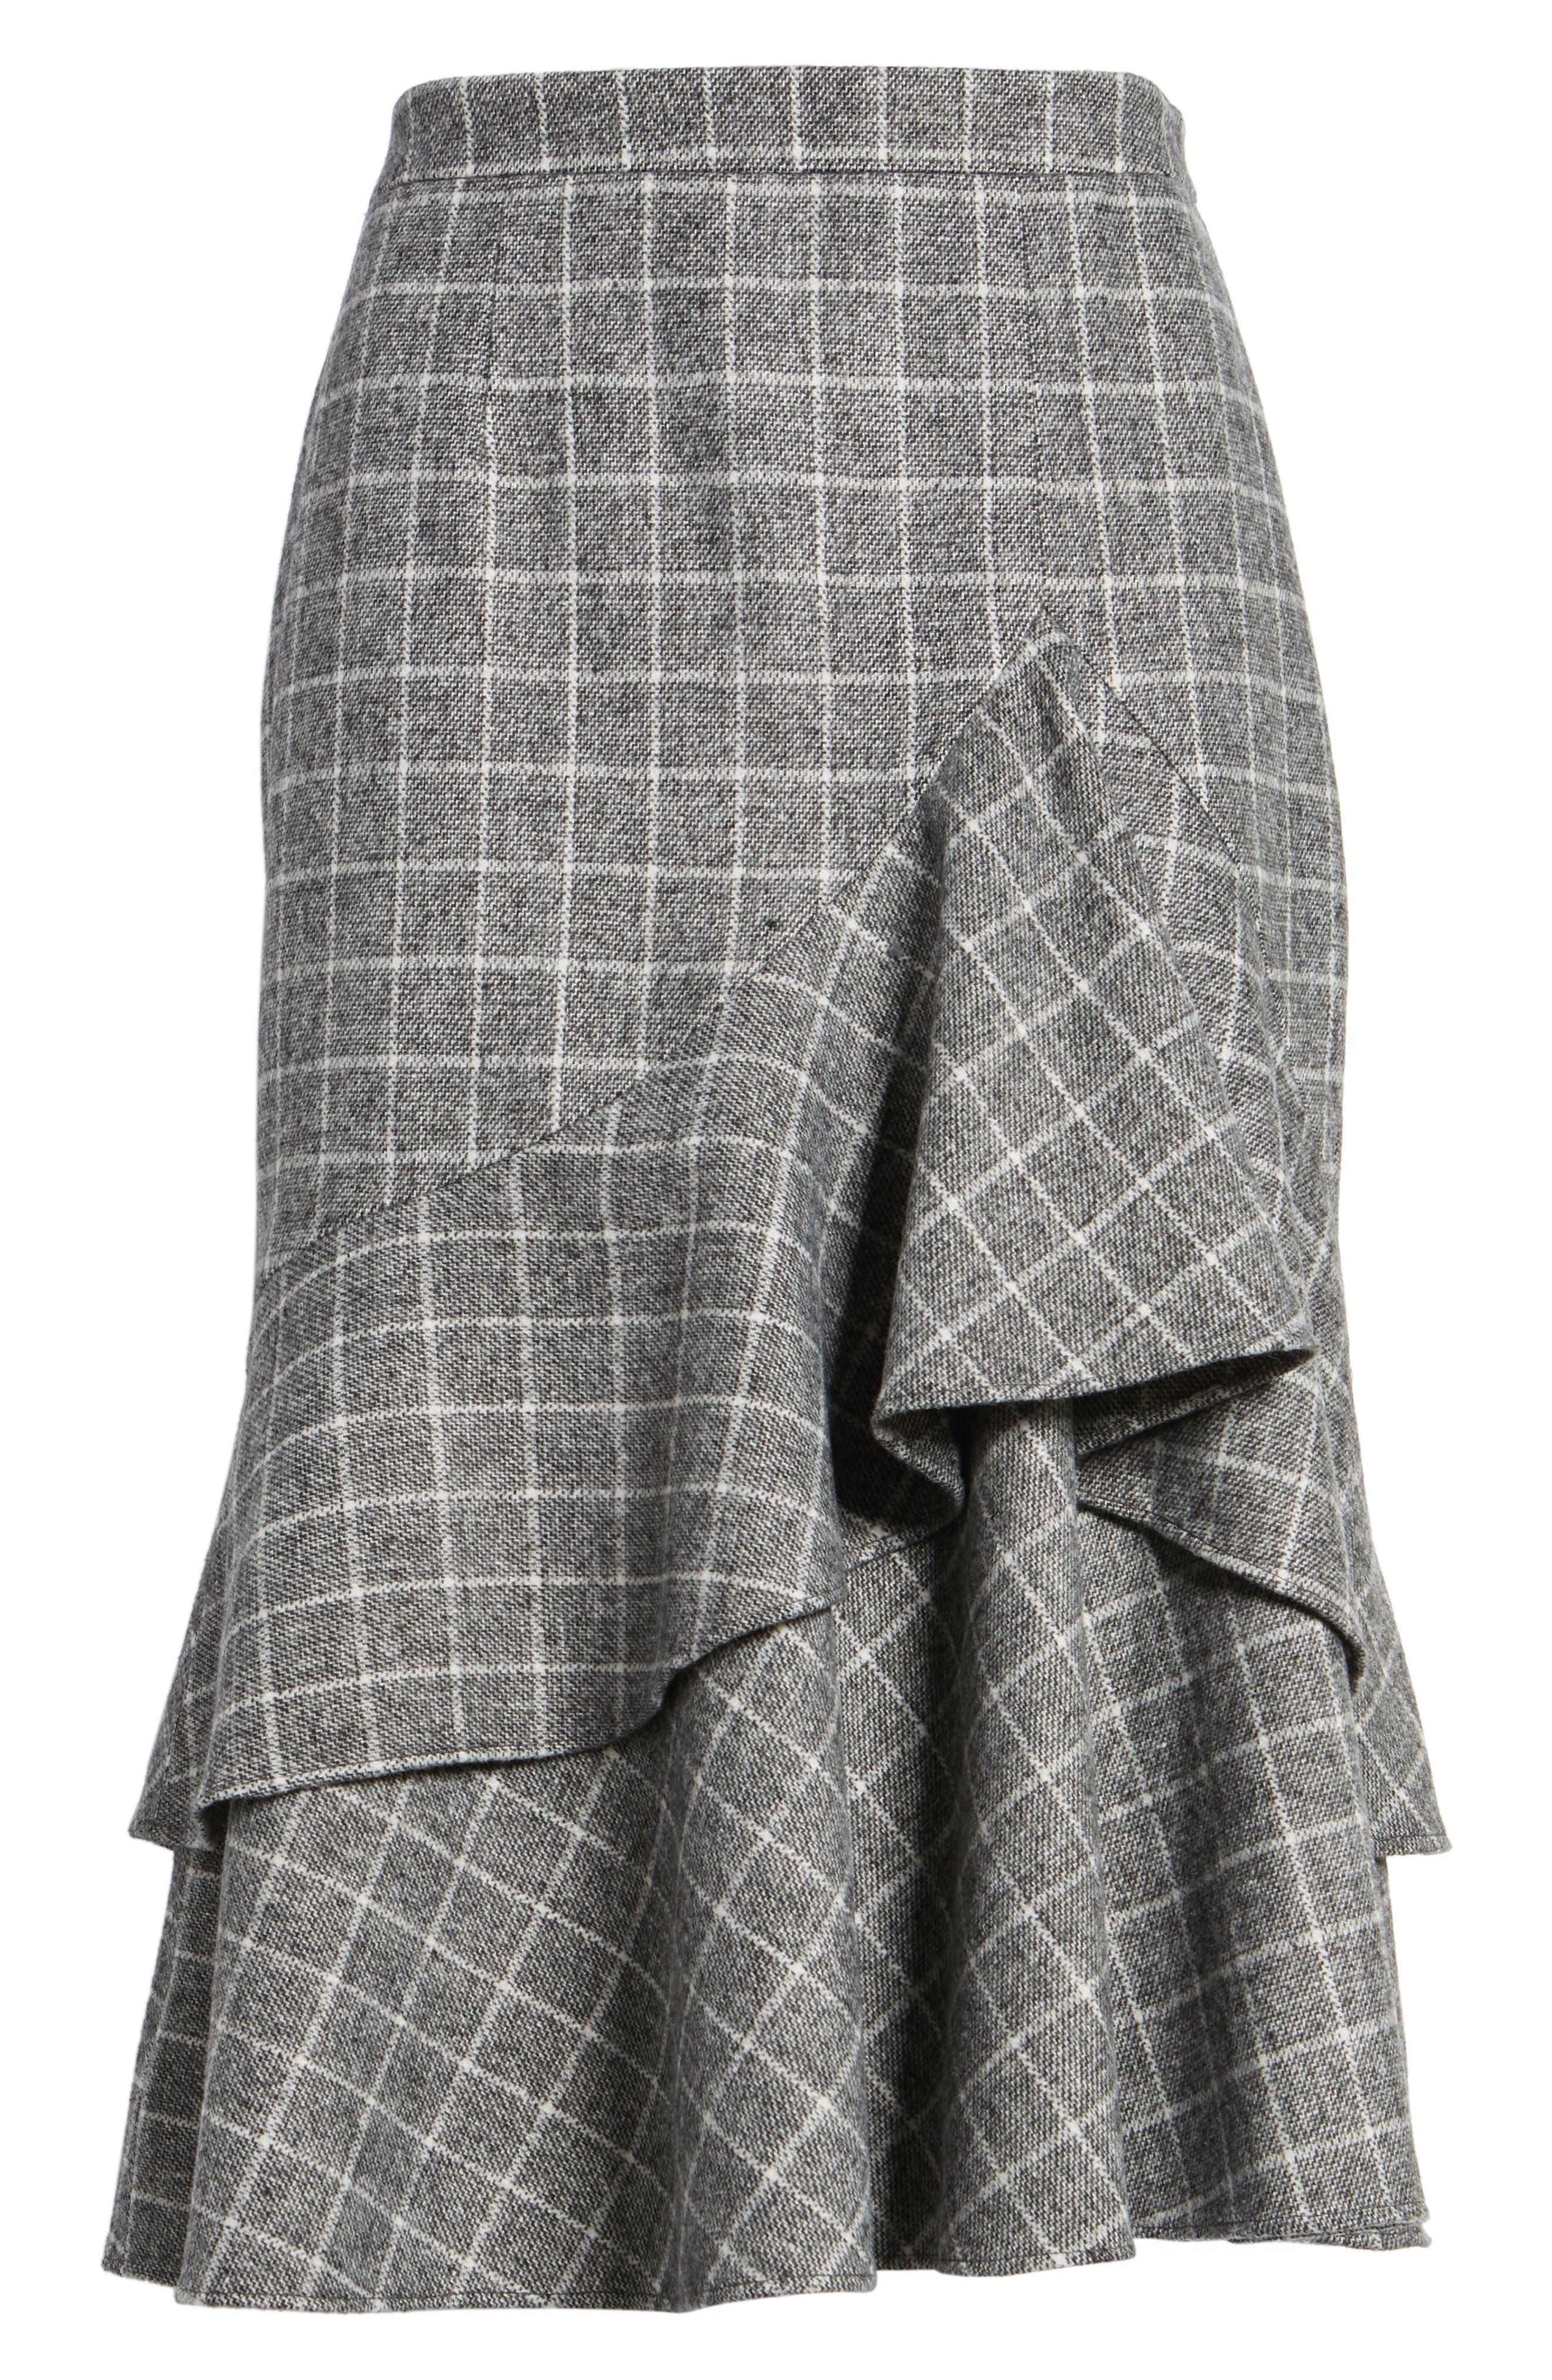 Windowpane Print Ruffle Skirt,                             Alternate thumbnail 6, color,                             001